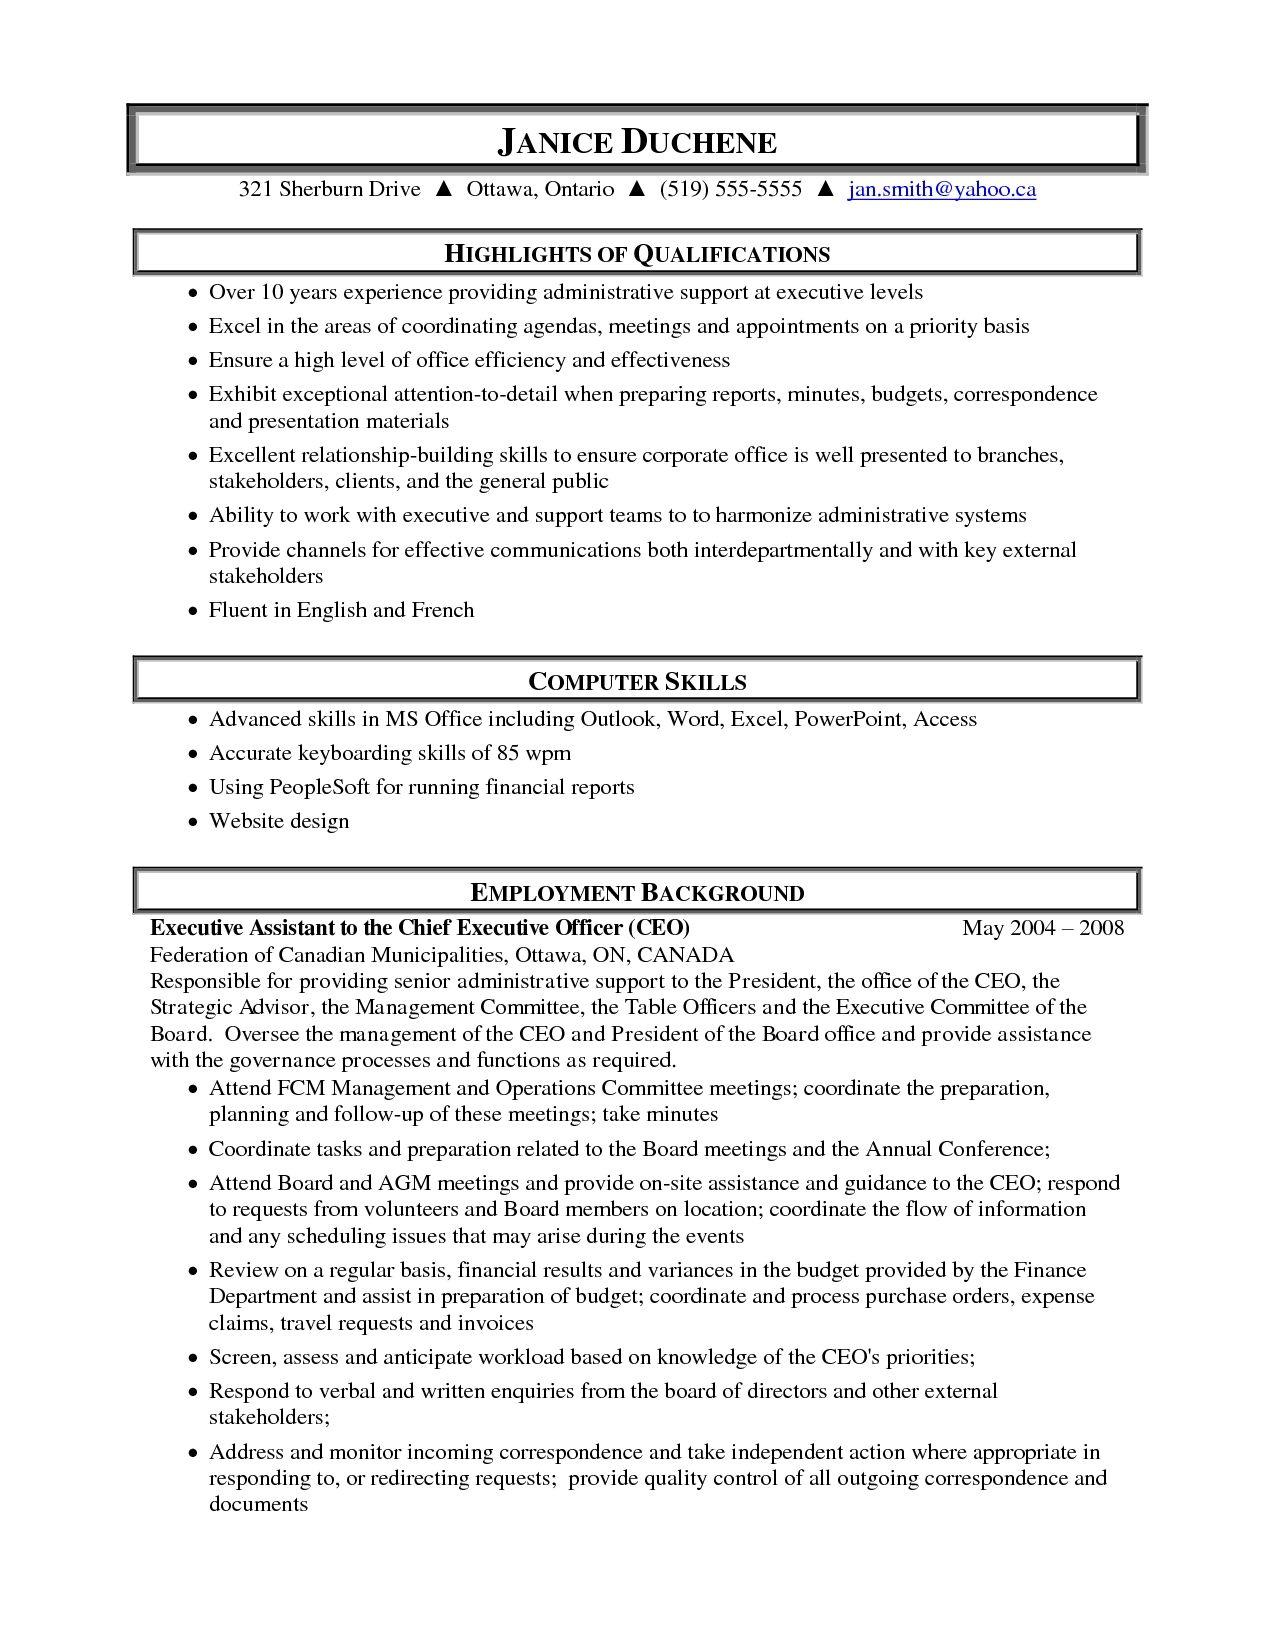 Medical Assistant Skills Resume Executive Resumes Samples Free Inspiration Decoration Resume